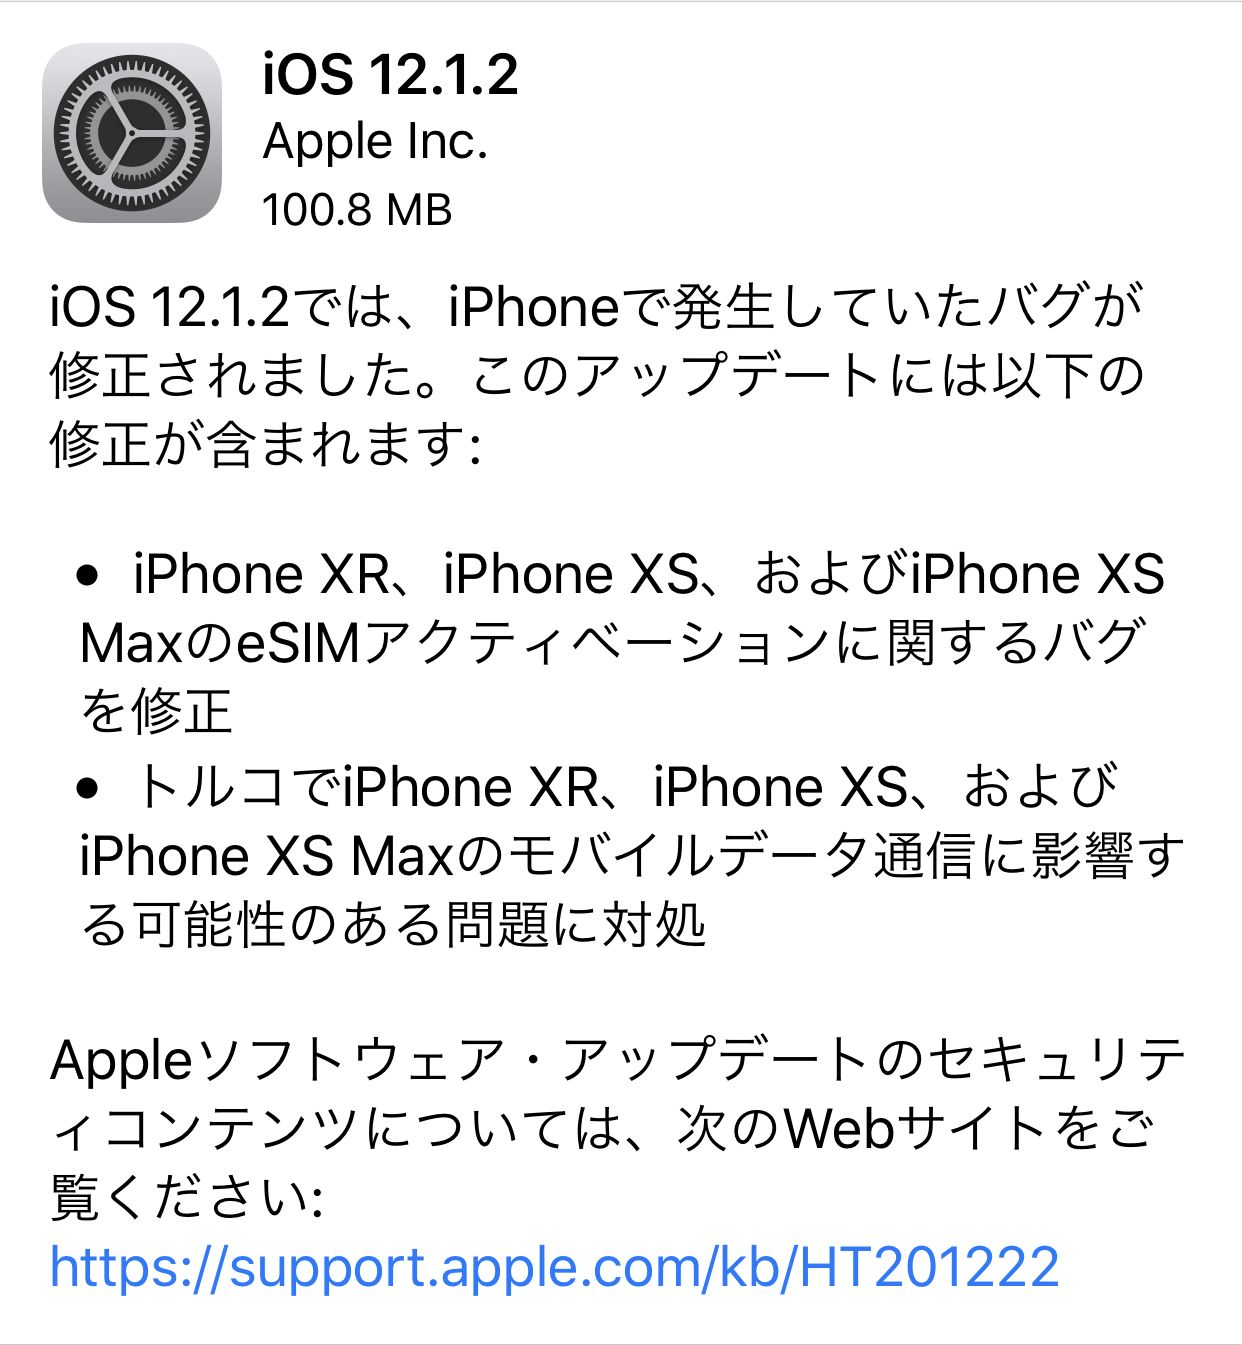 iPhone XS MaxをiOS 12.1.2にアップデート